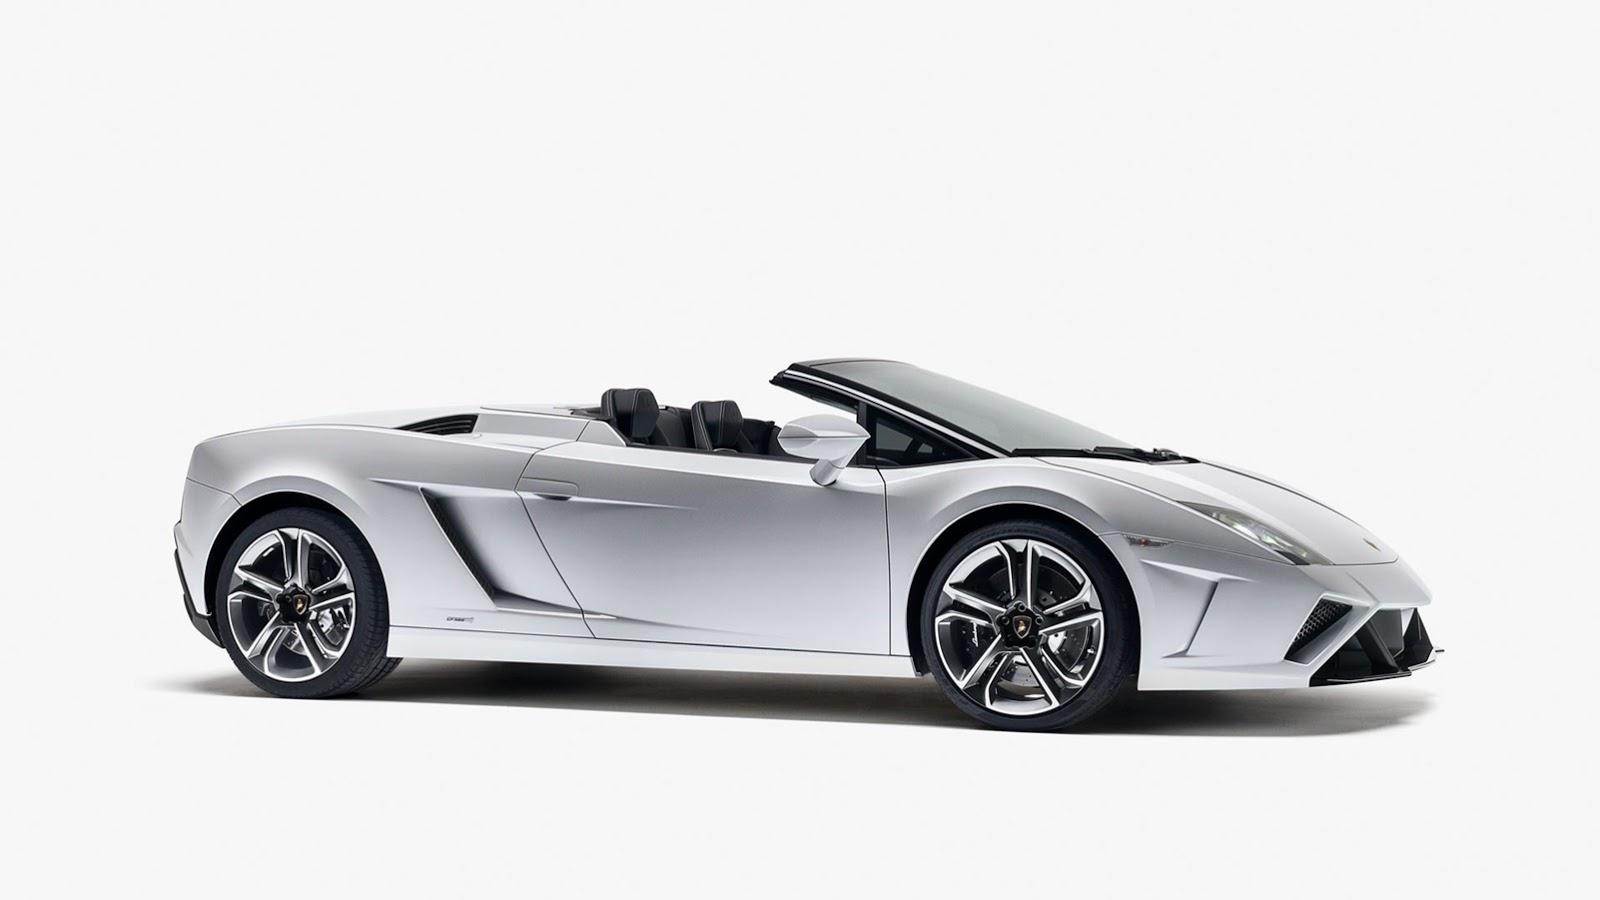 Lamborghini_Gallardo_Spyder_Facelift_Side_2